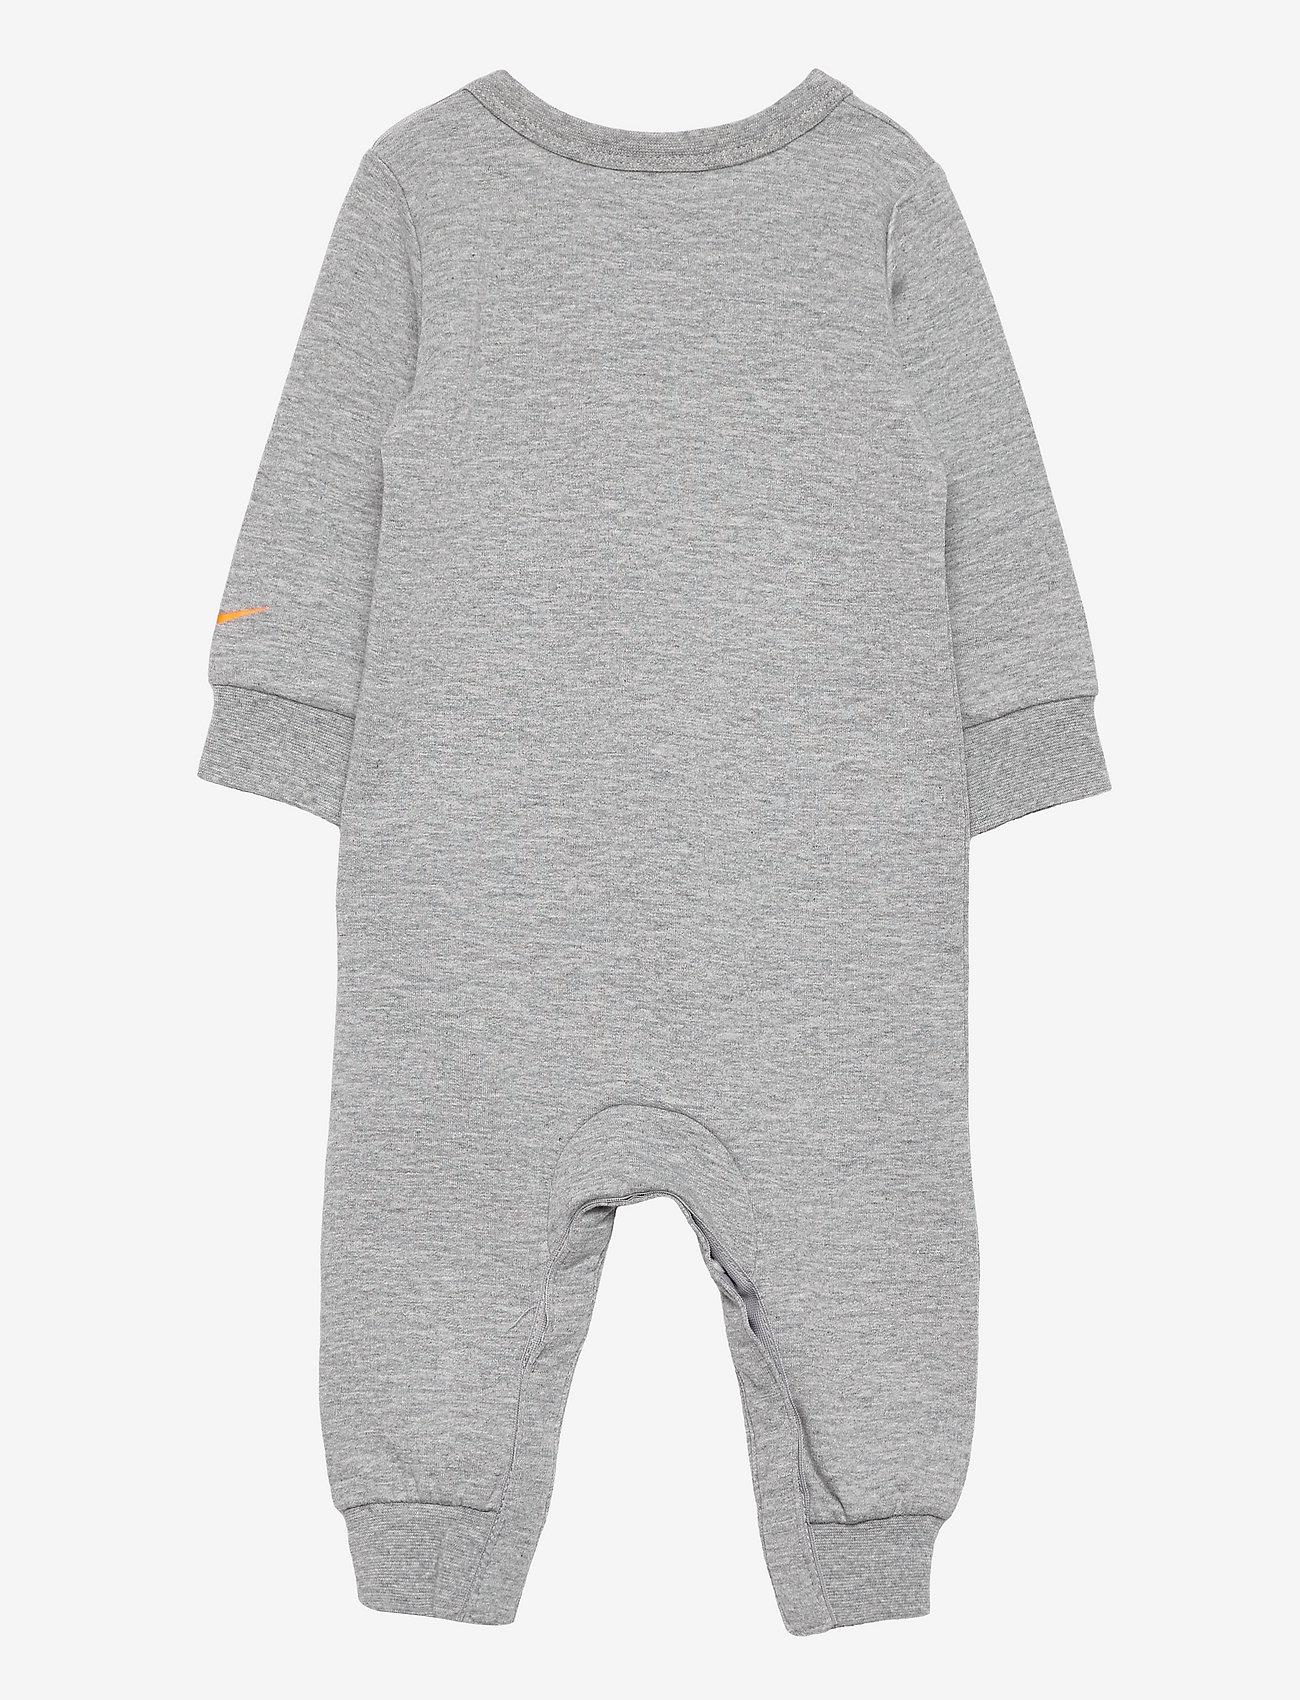 Nike - NKB NIKE BLOCK CO + SOCK SET - langärmelig - dk grey heather - 1